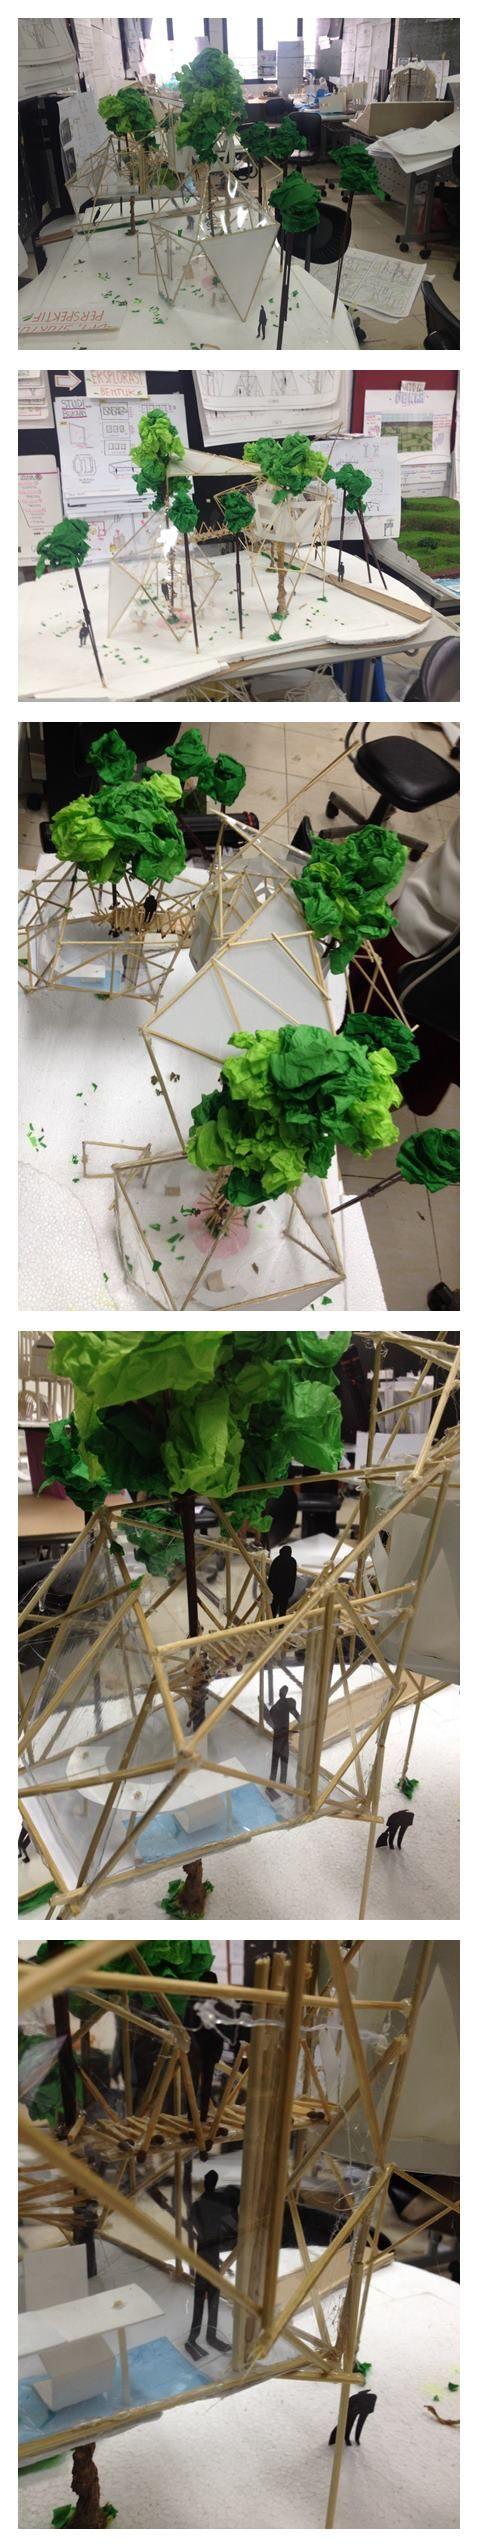 Design Class 1 Project 2 : Treemangle Spaces, Space for Artist- Rachel Amanda.